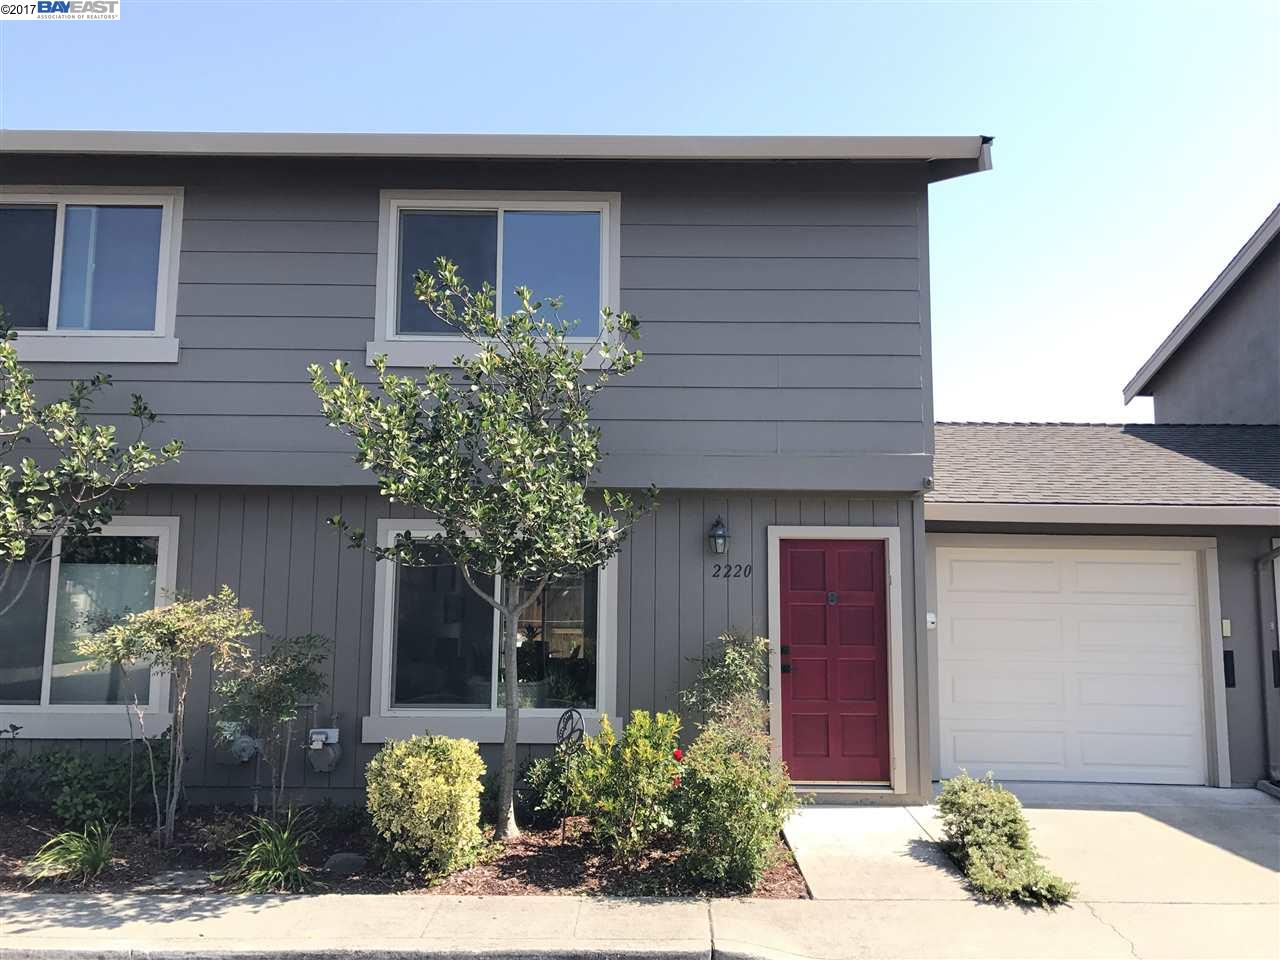 2220 Windlass Way, SAN LEANDRO, CA 94577